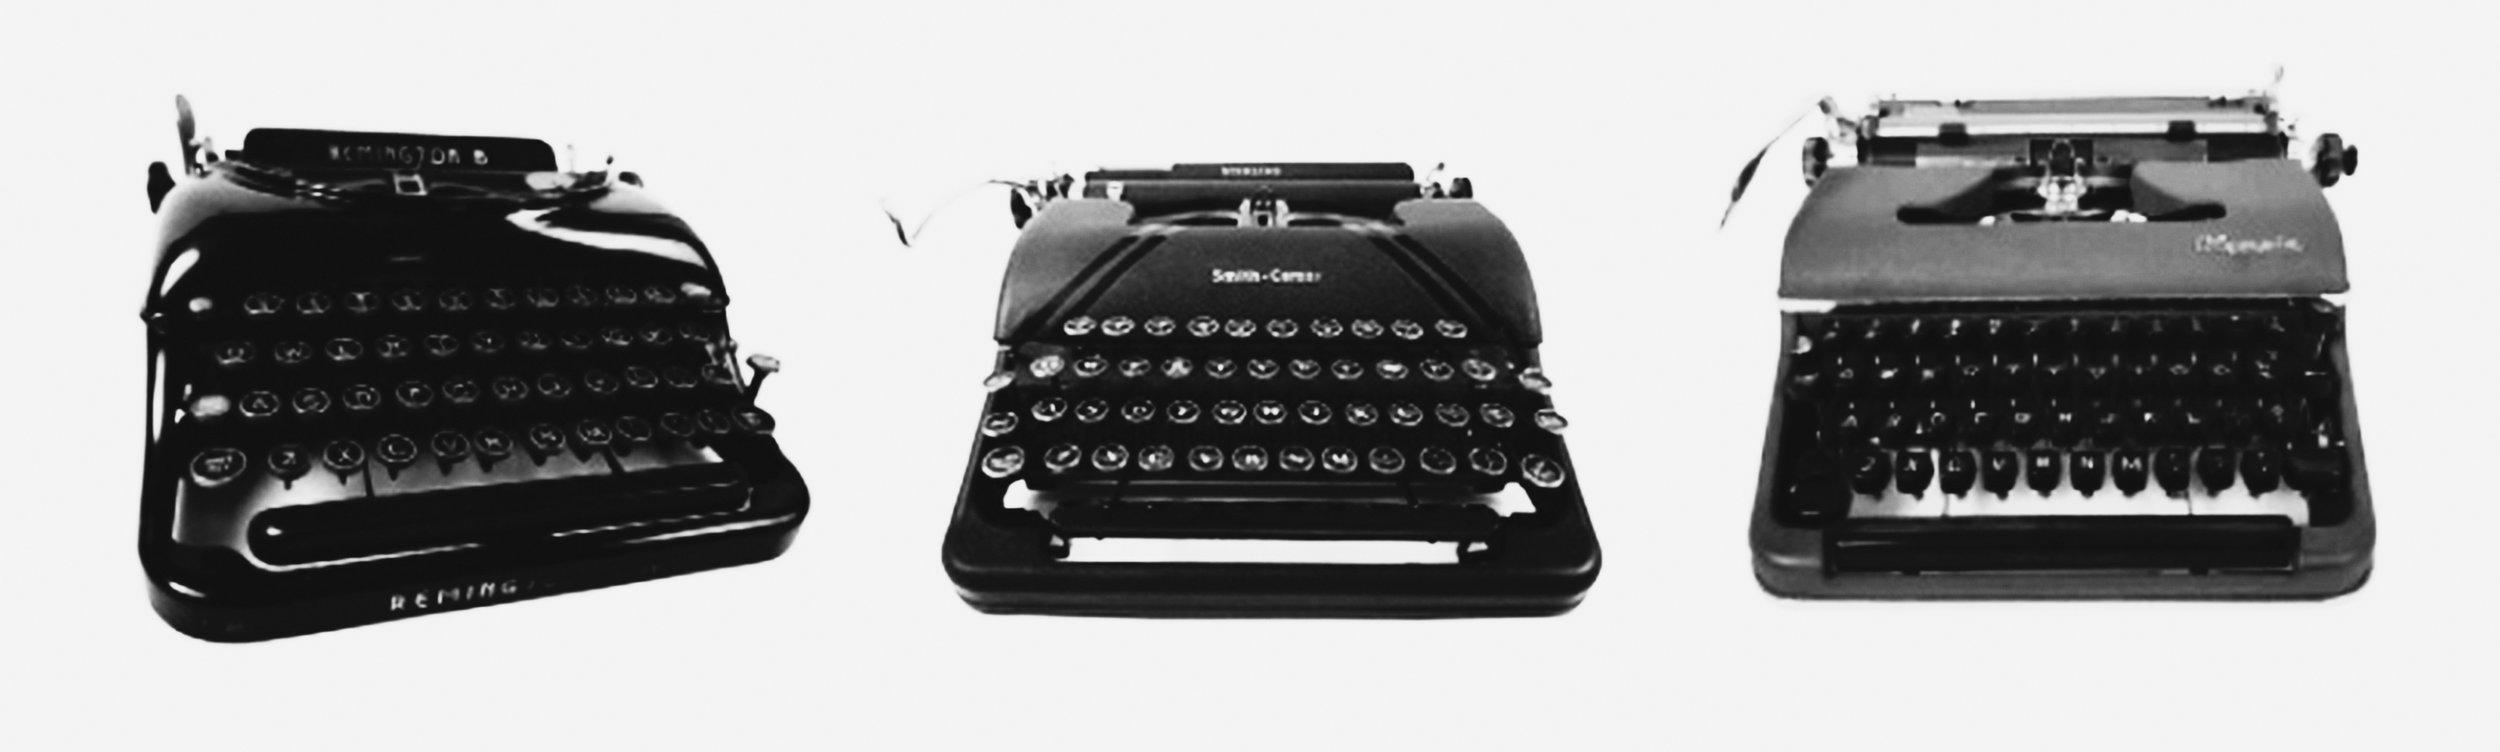 Typewriters K-RGB.jpg